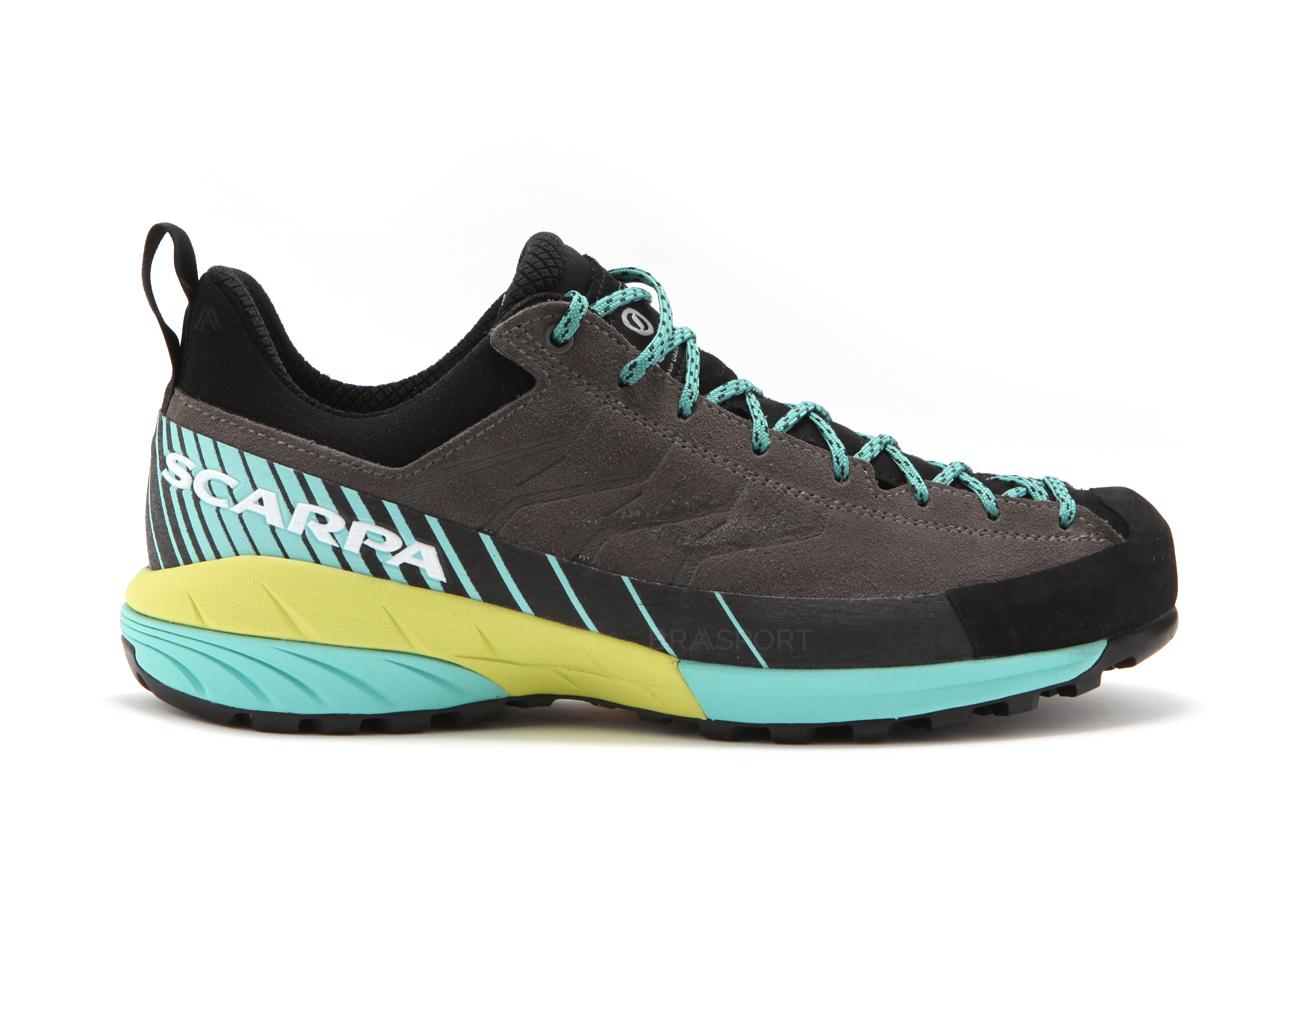 scarpa_mescalito_dame1.jpg